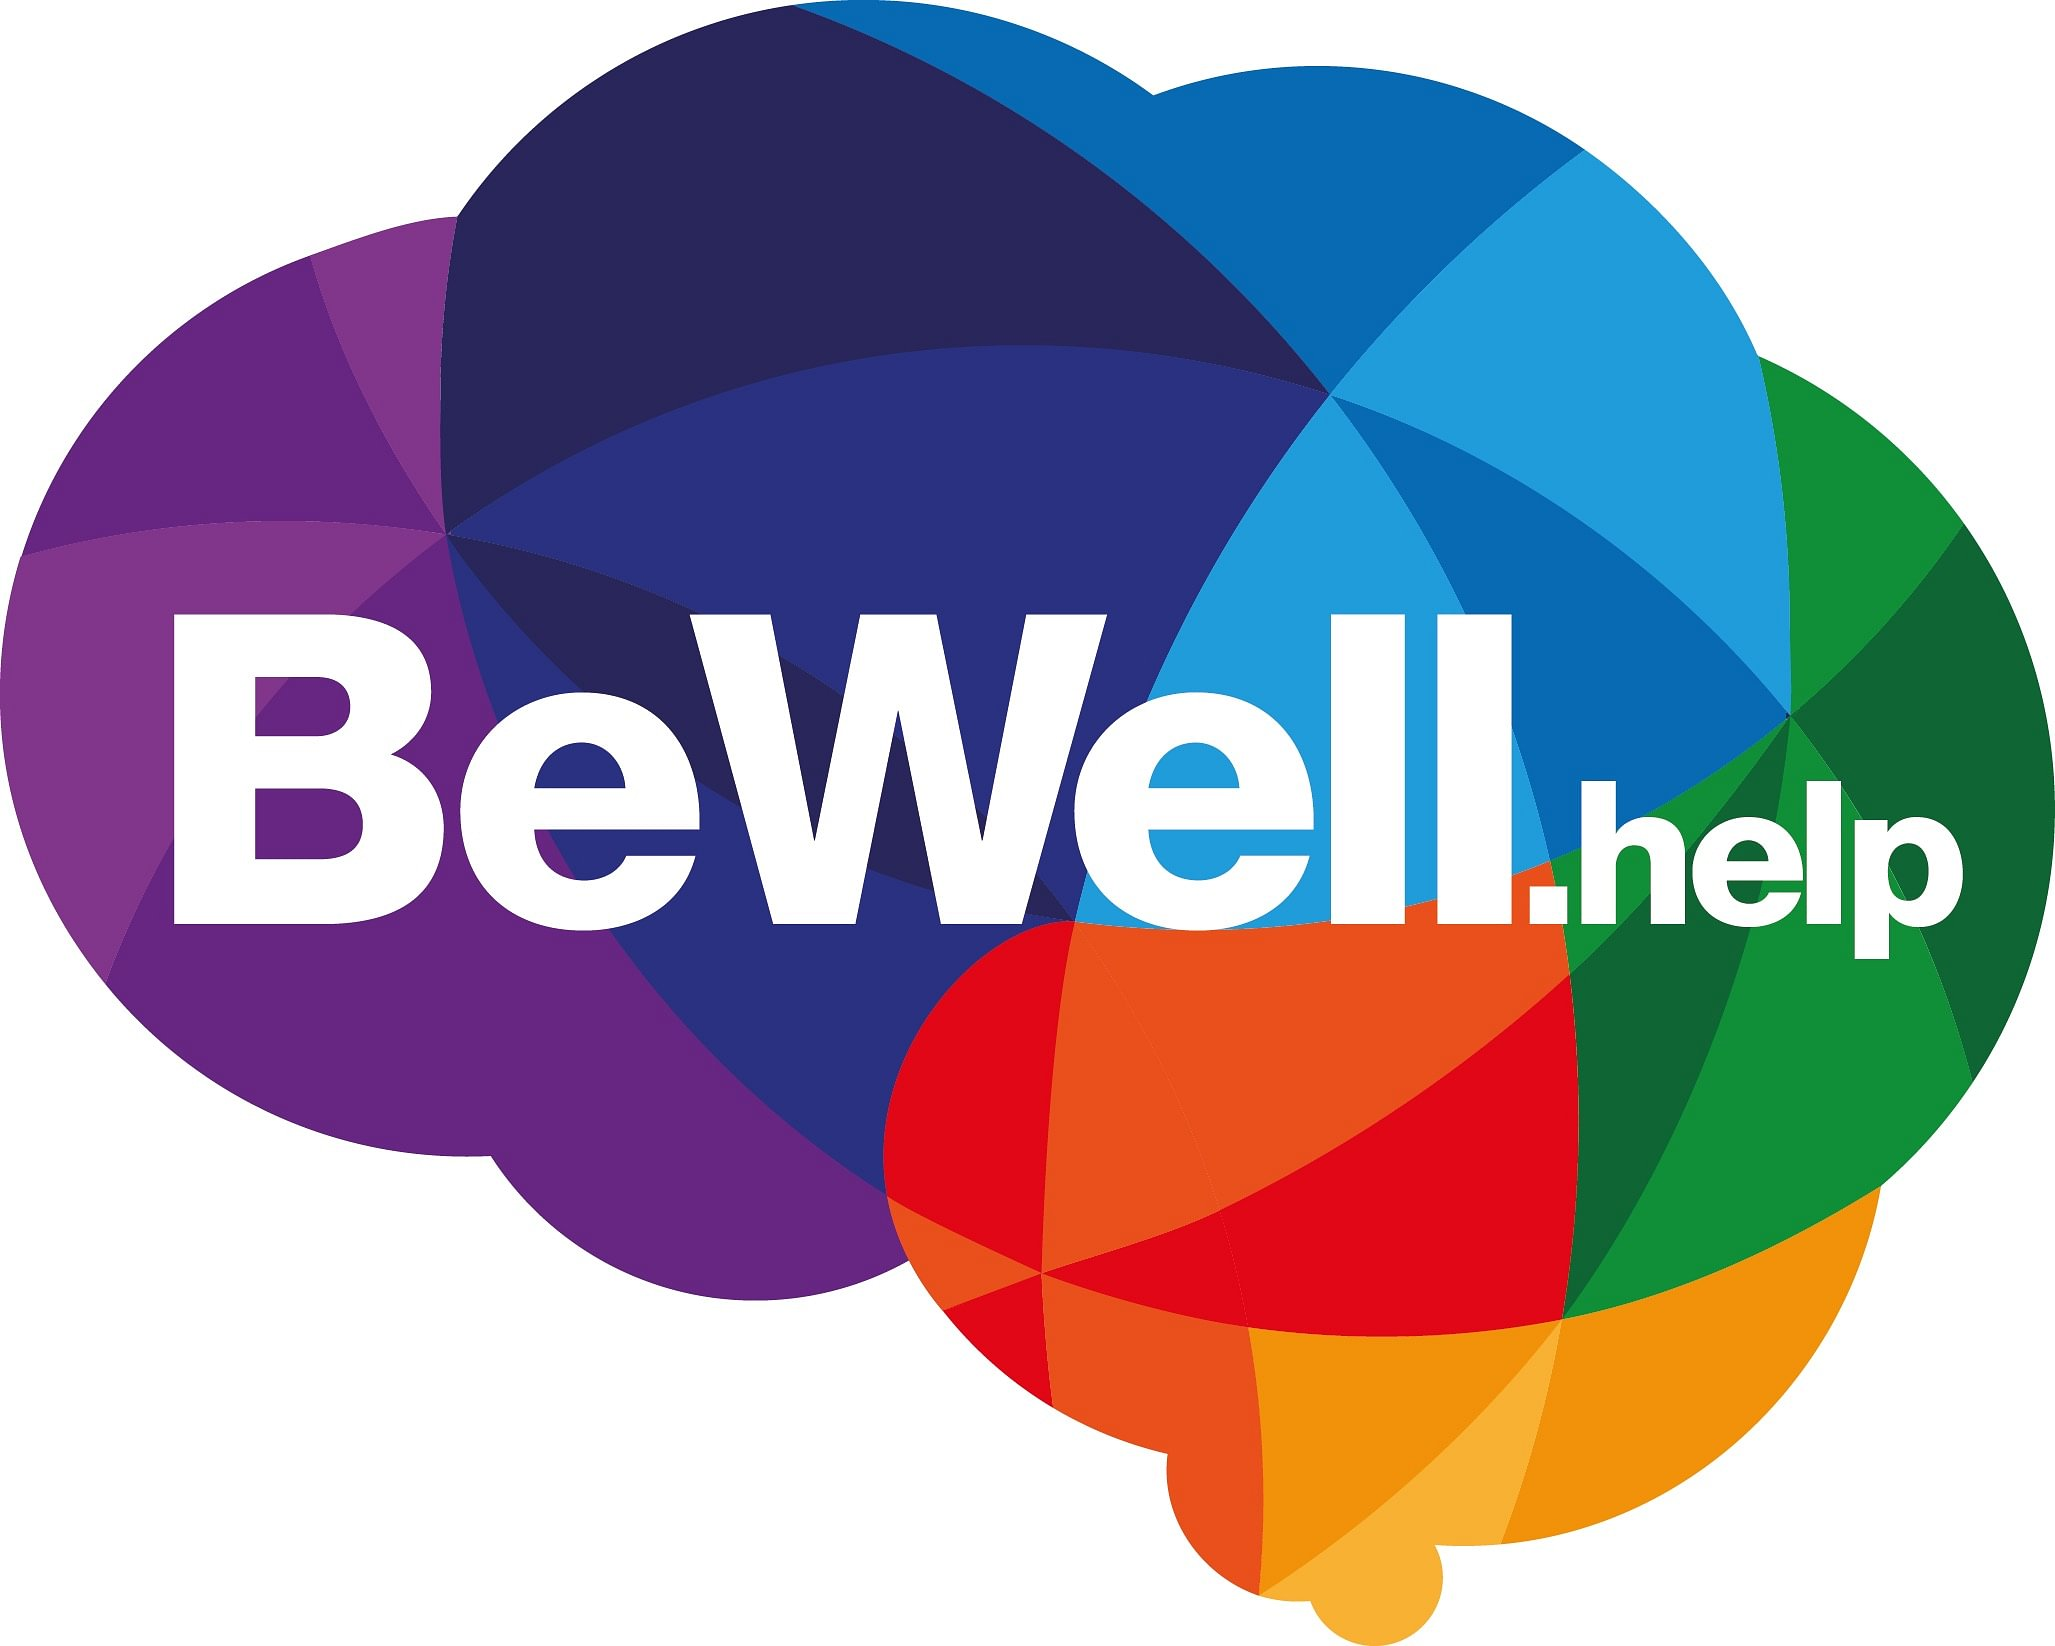 BeWell.help